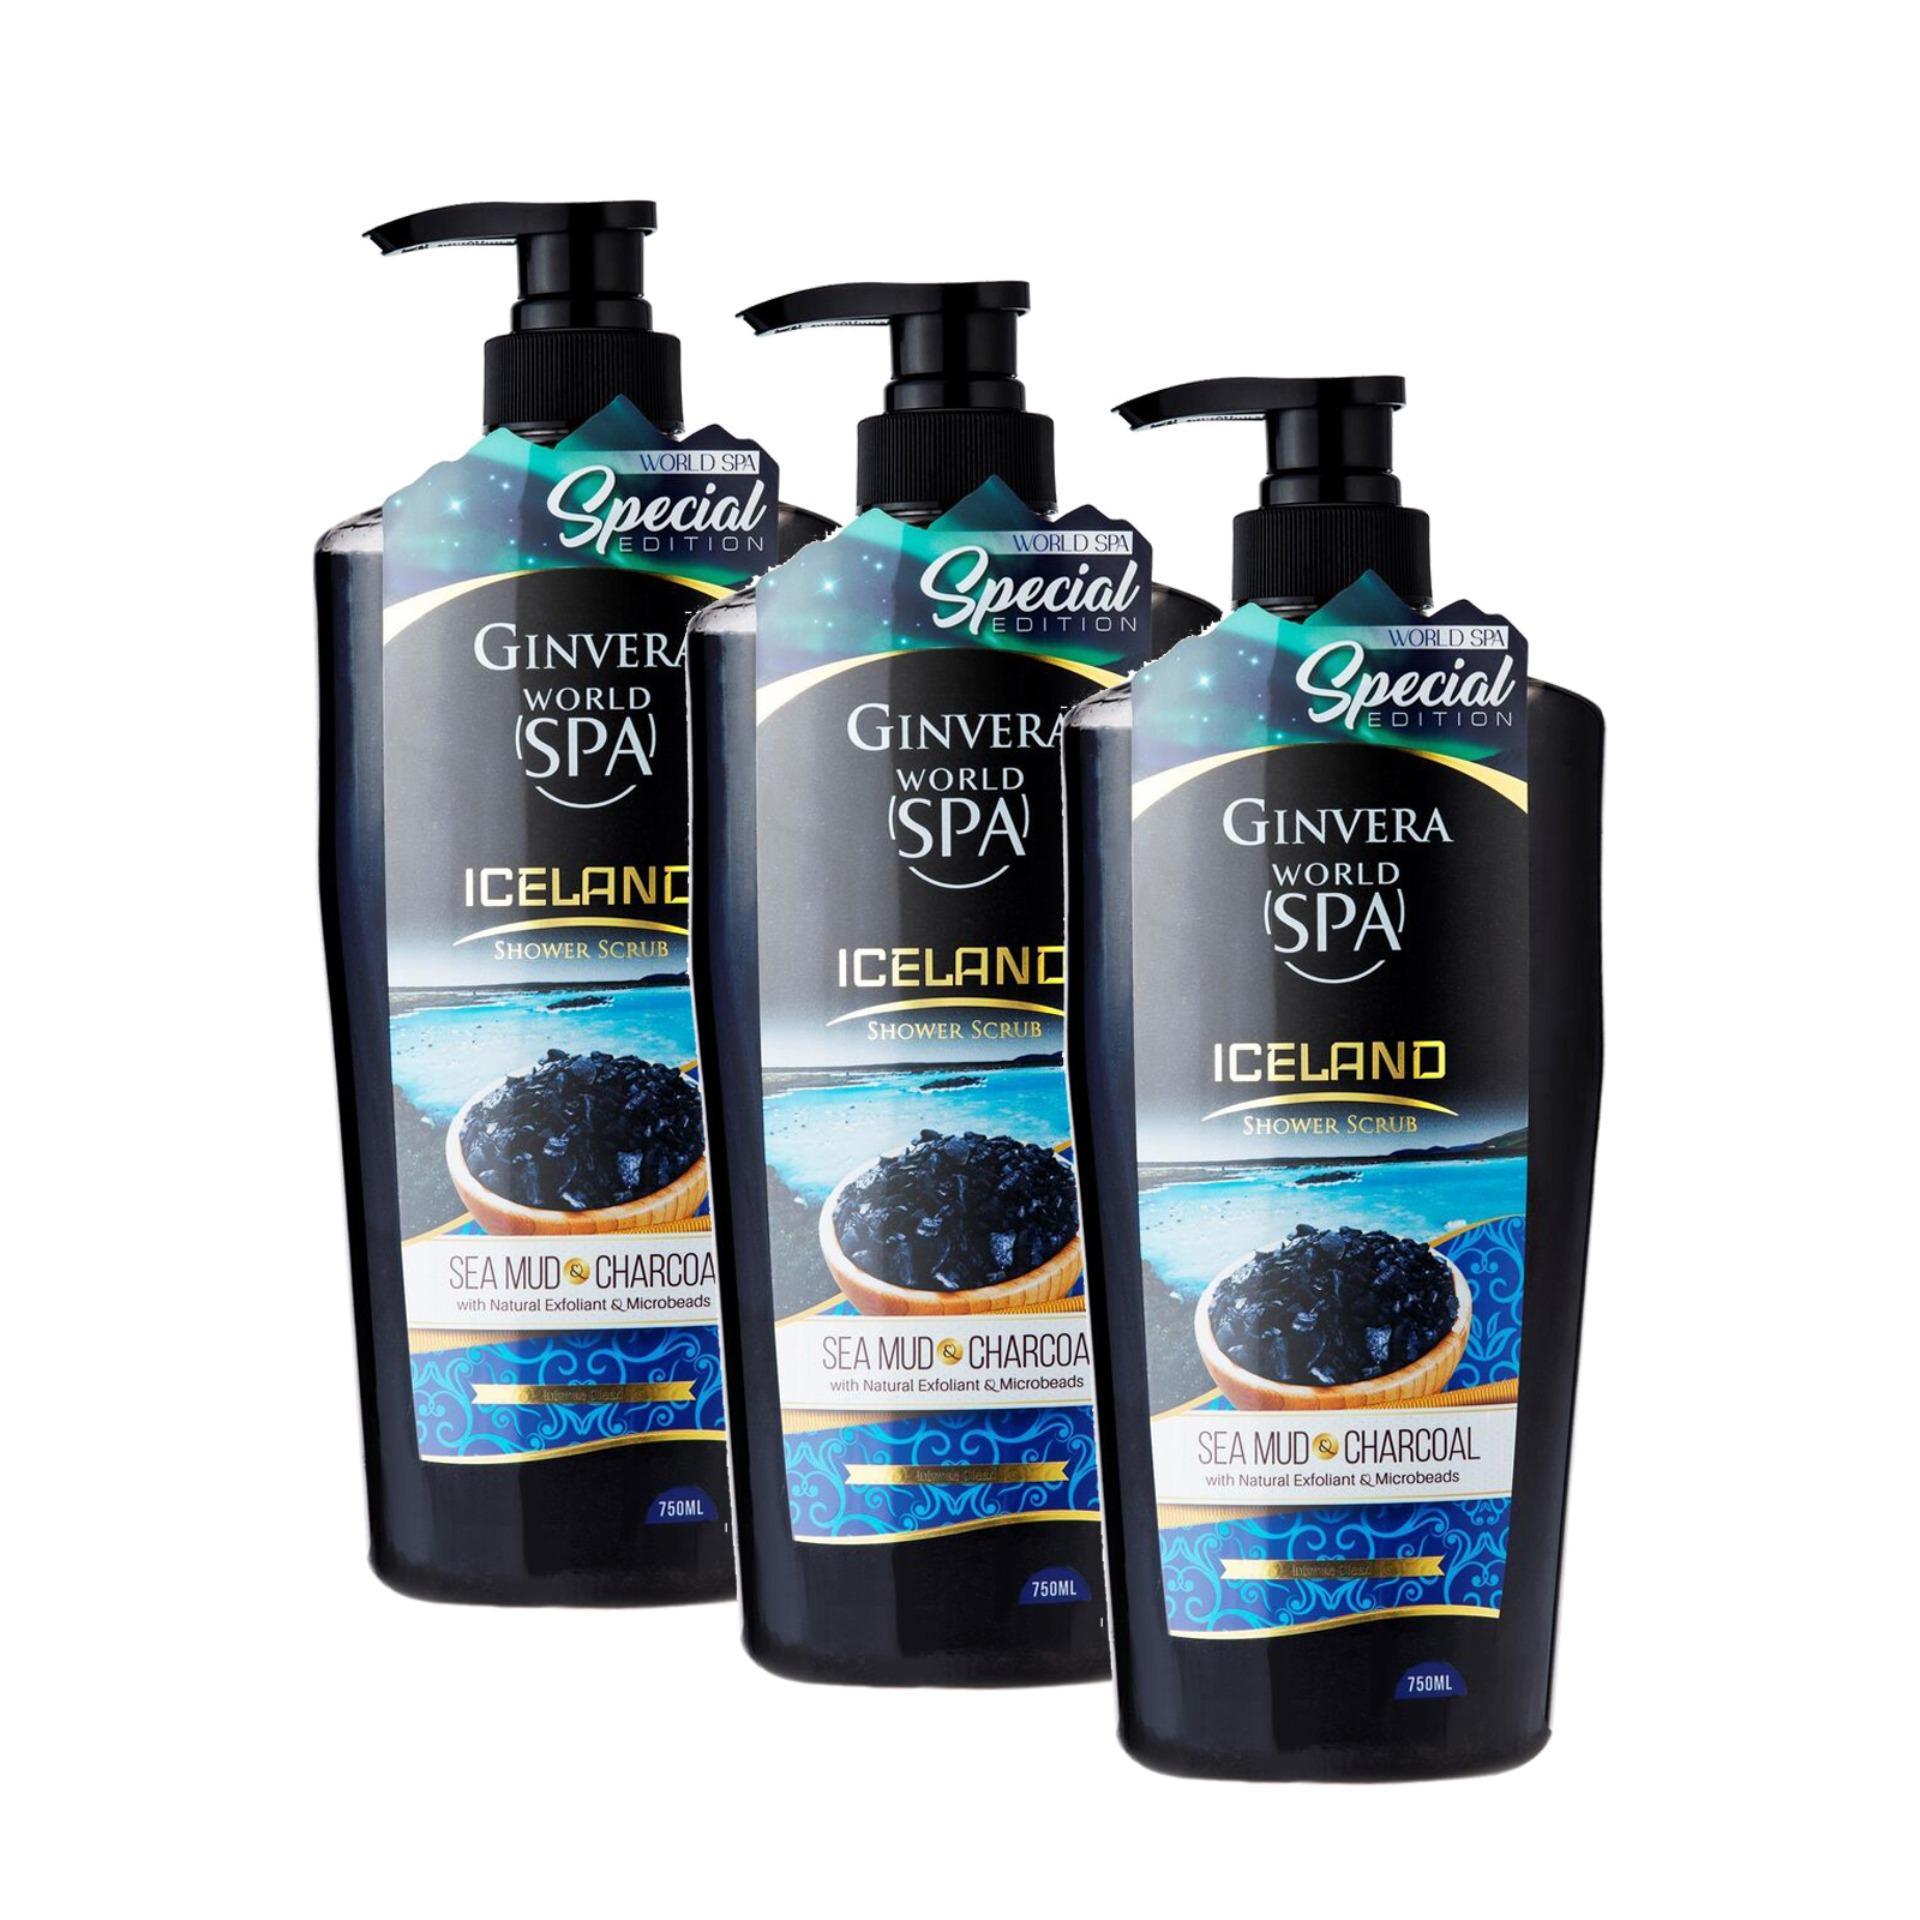 Ginvera World Spa Iceland Sea Mud & Charcoal Shower Scrub 750ml x 3